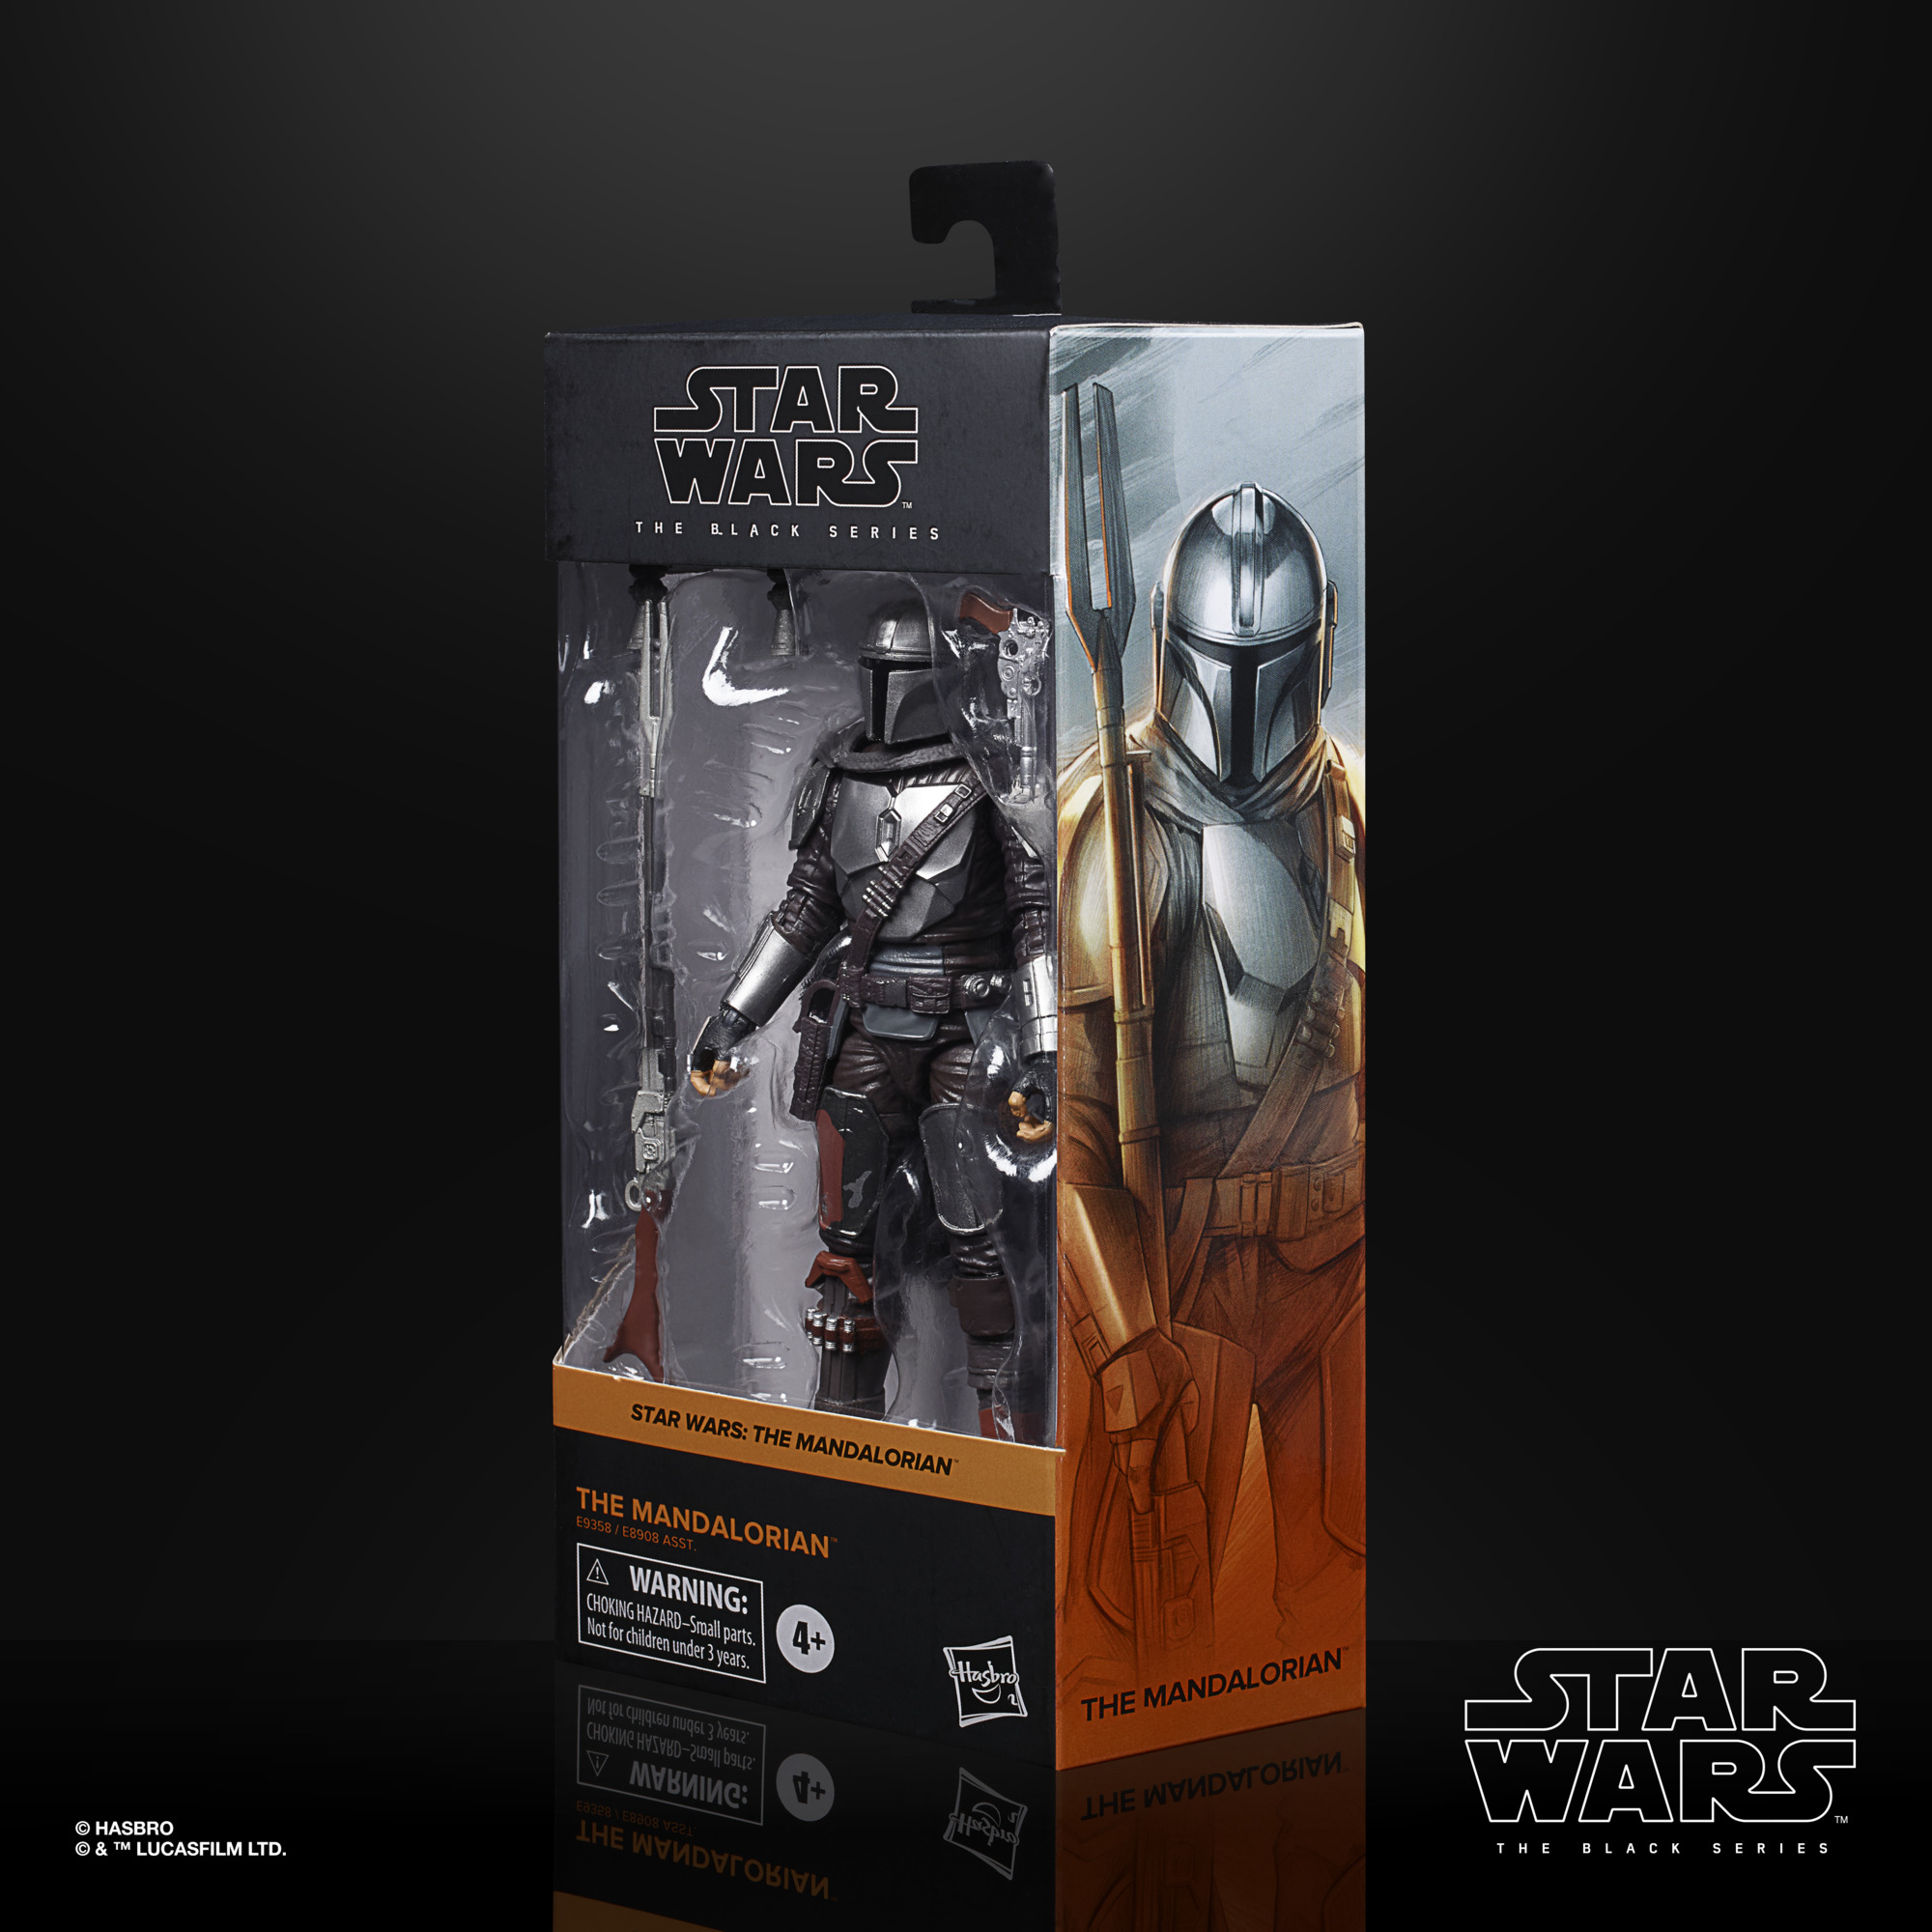 Star Wars The Black Series The Mandalorian (Beskar Armor) 15cm E93585X00 5010993749218